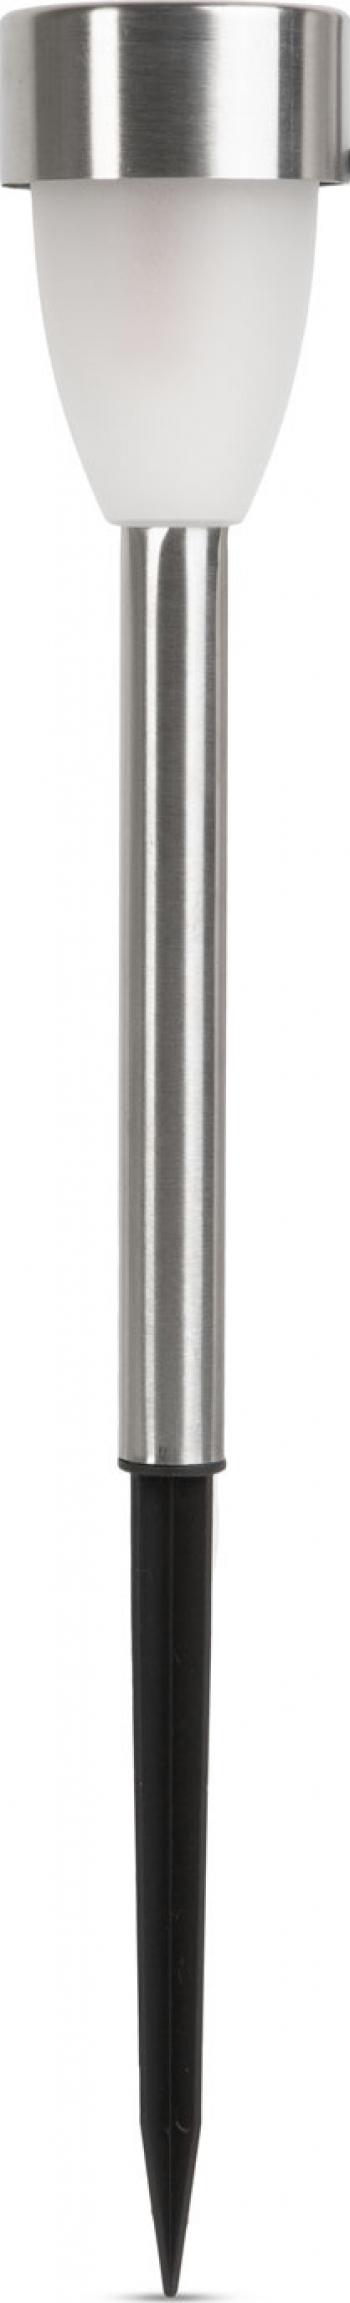 Lampa Solara LED Lumina Alb Rece Metal Inaltime 37cm Corpuri de iluminat